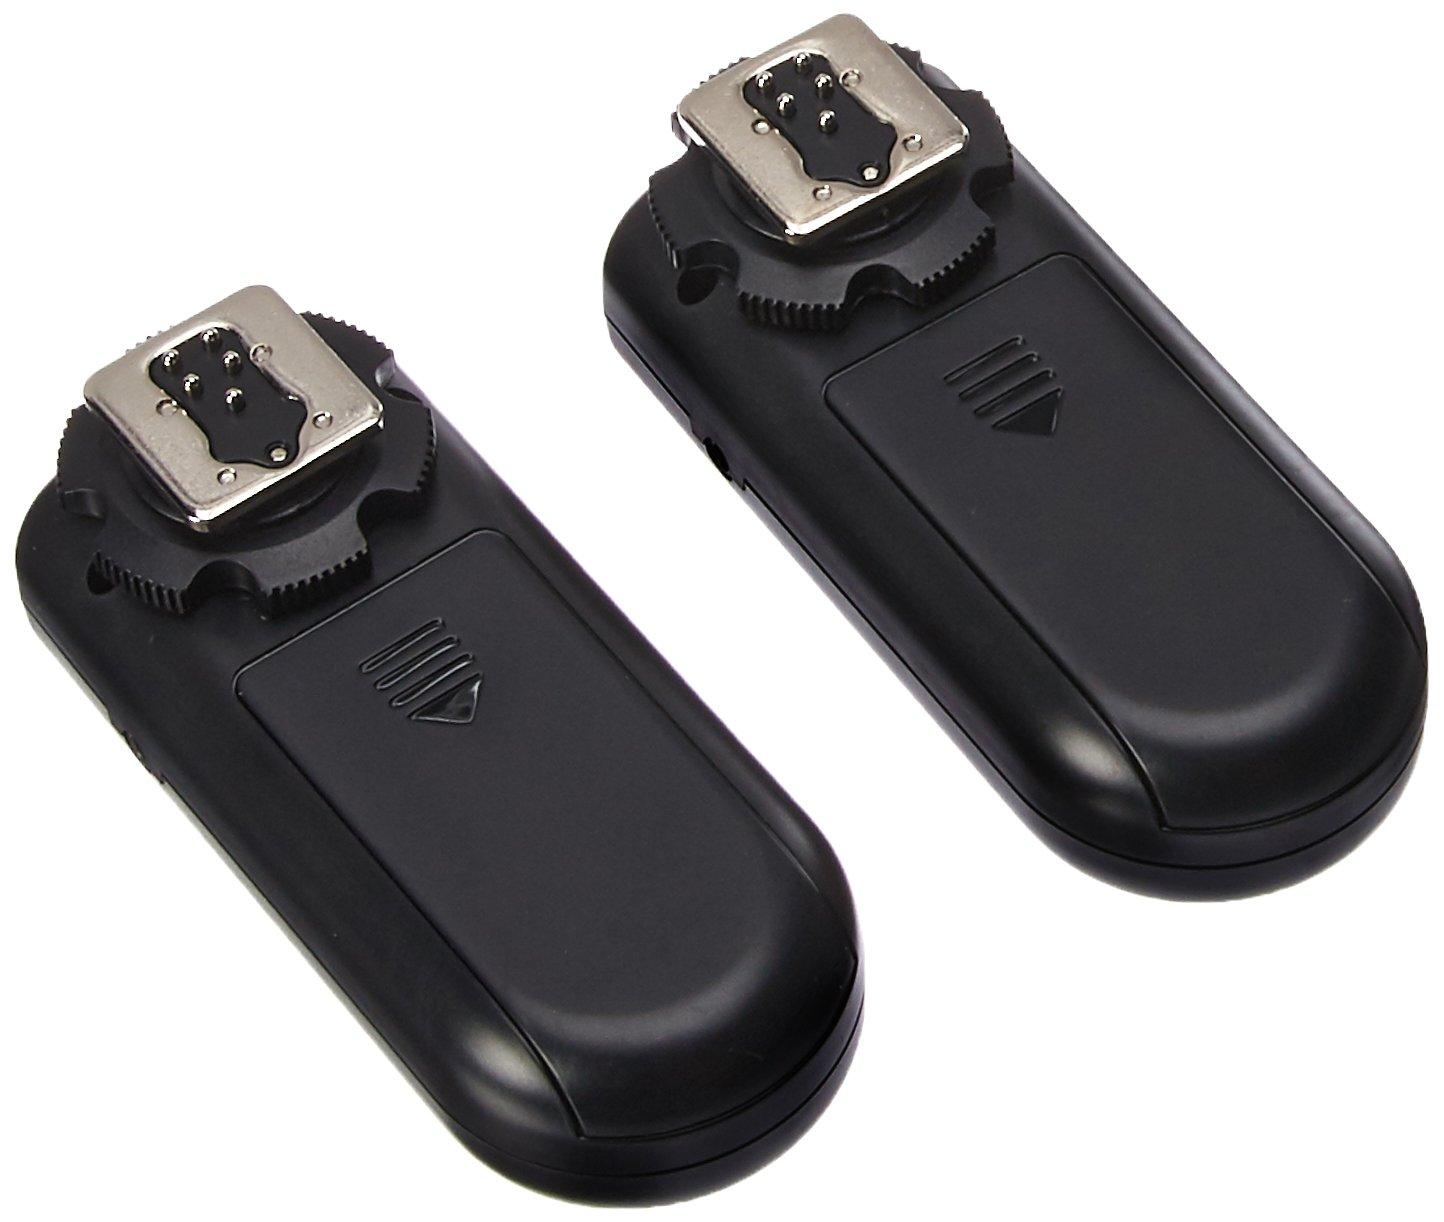 1//320sec Sync Speed Yongnuo RF-603 II 16-Ch Wireless Flash Trigger for Canon 3-Pin Connection 1D//5D//7D//10D//20D//30D//40D//50D Cameras 2.4GHz